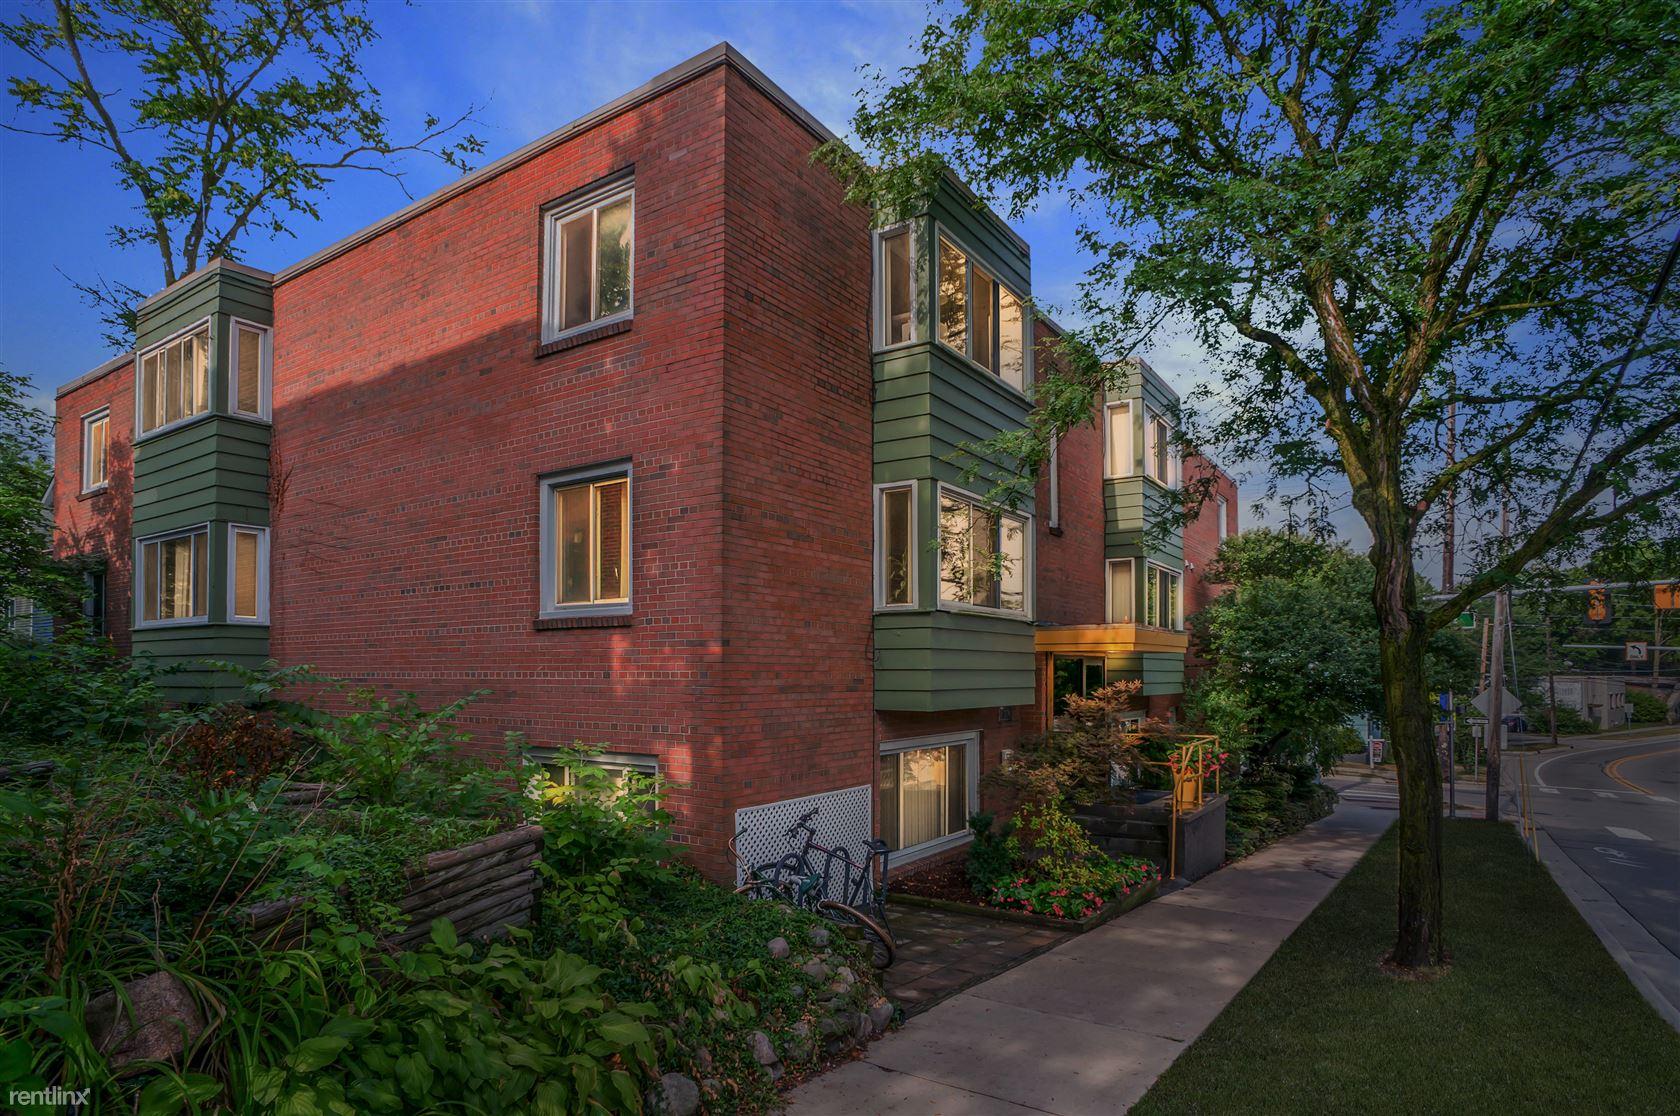 220 N 1st St, Ann Arbor, MI - $1,350